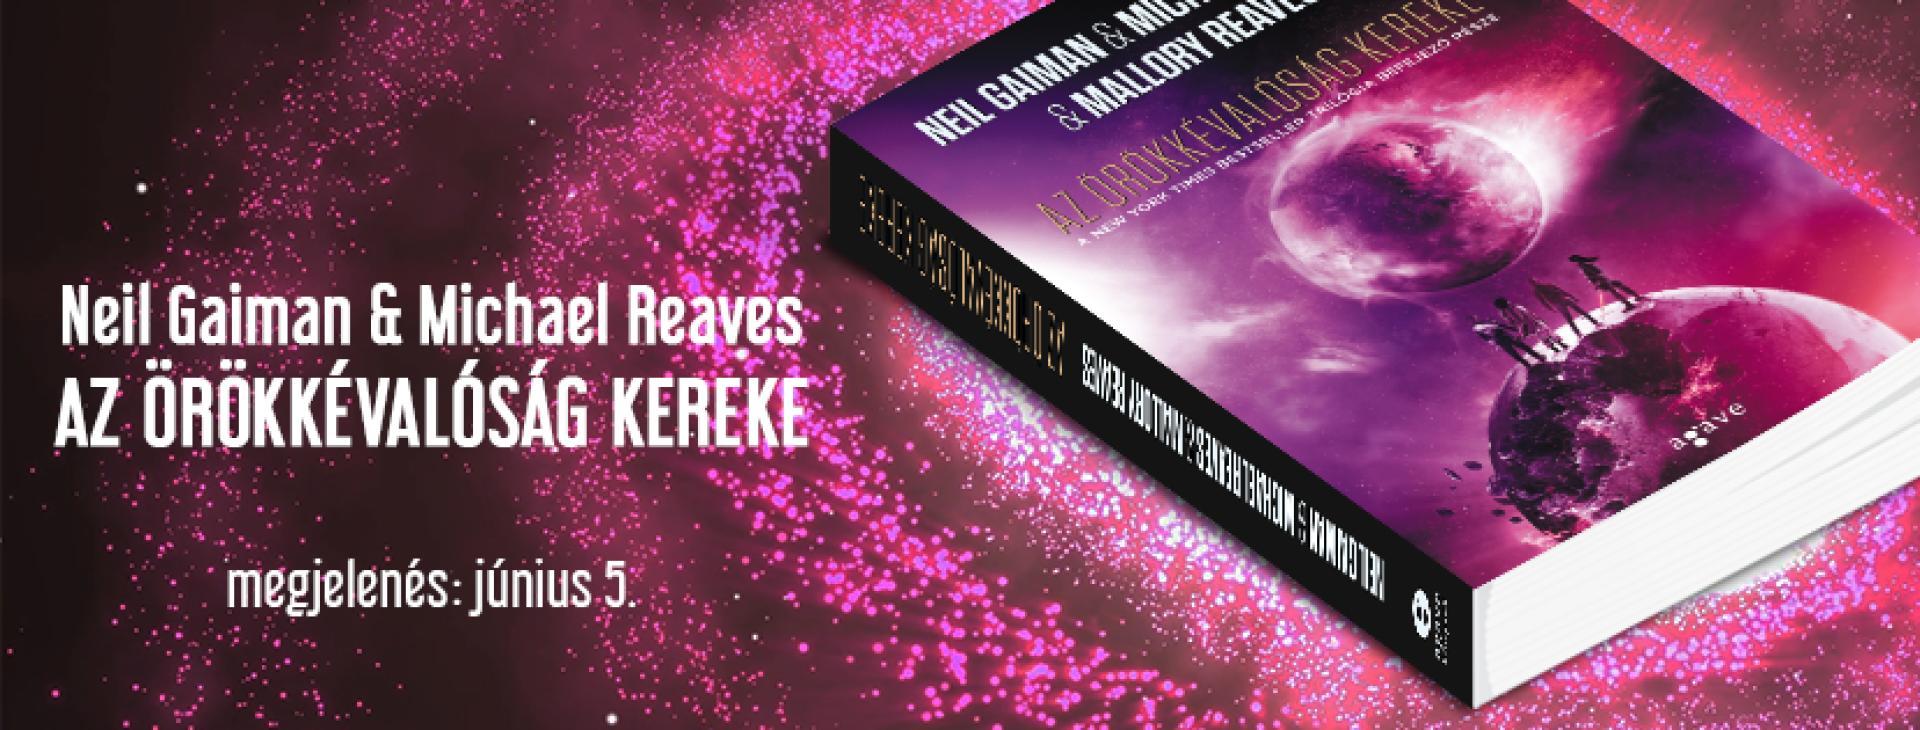 bookshakeV_5_kep